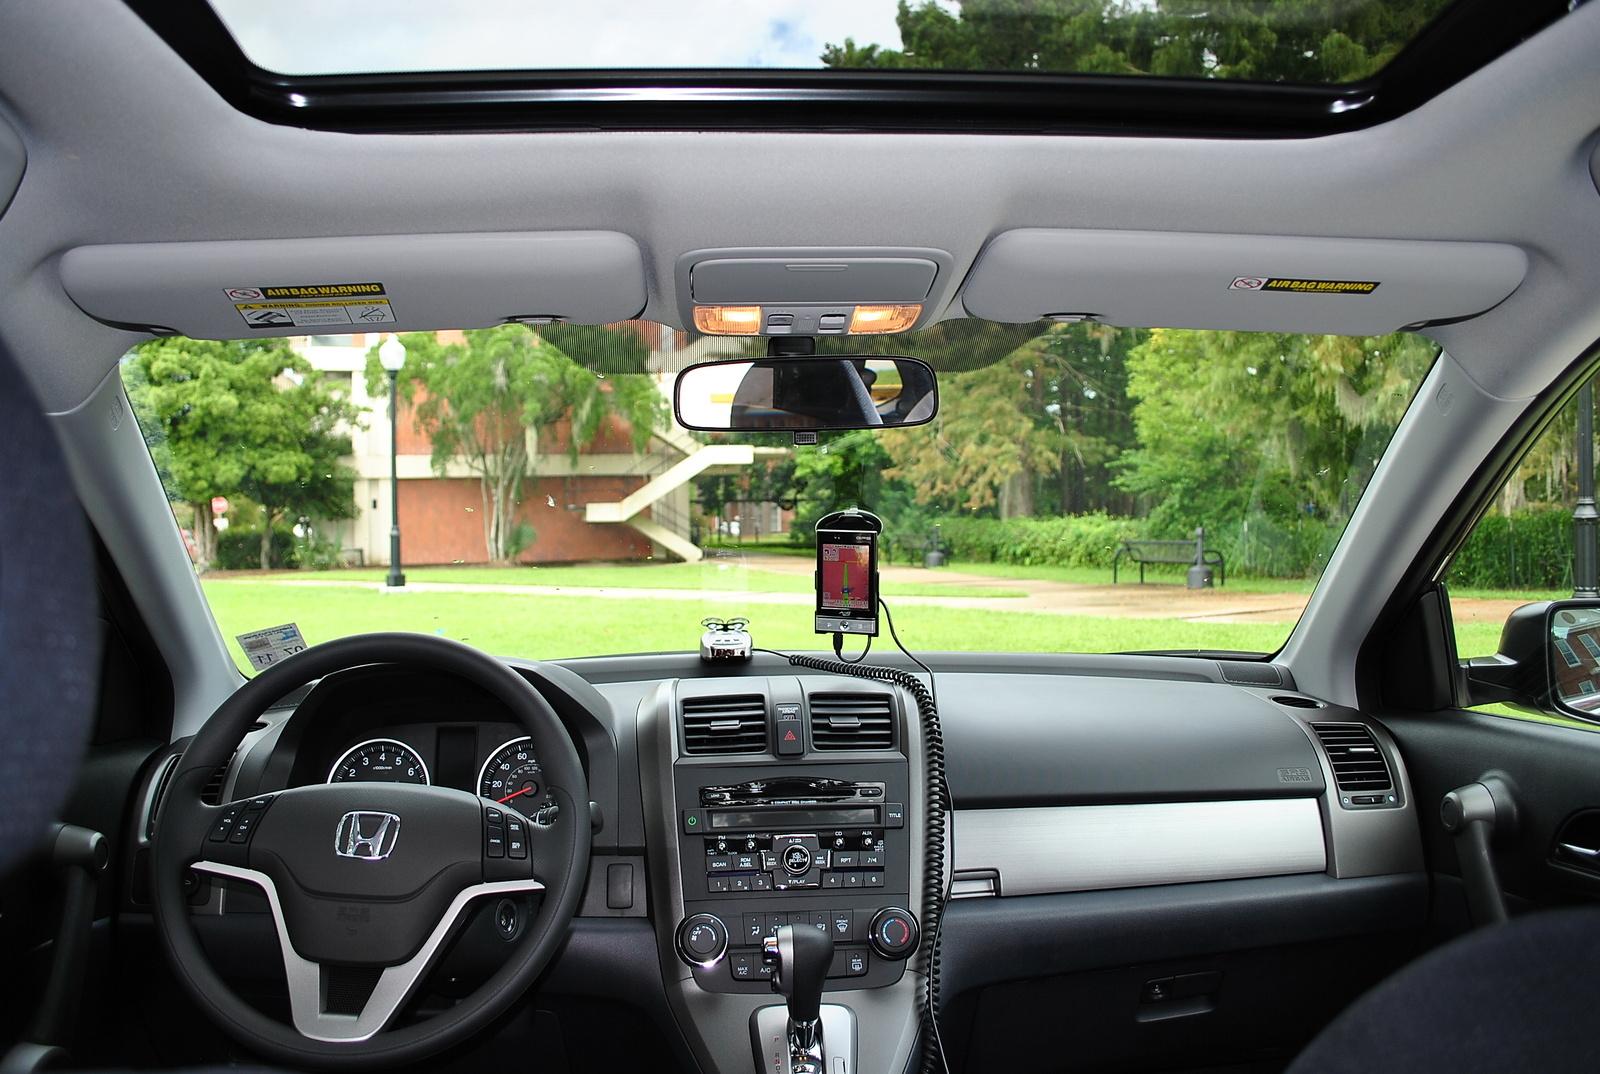 2011 Honda Accord Engine Problems Complaints